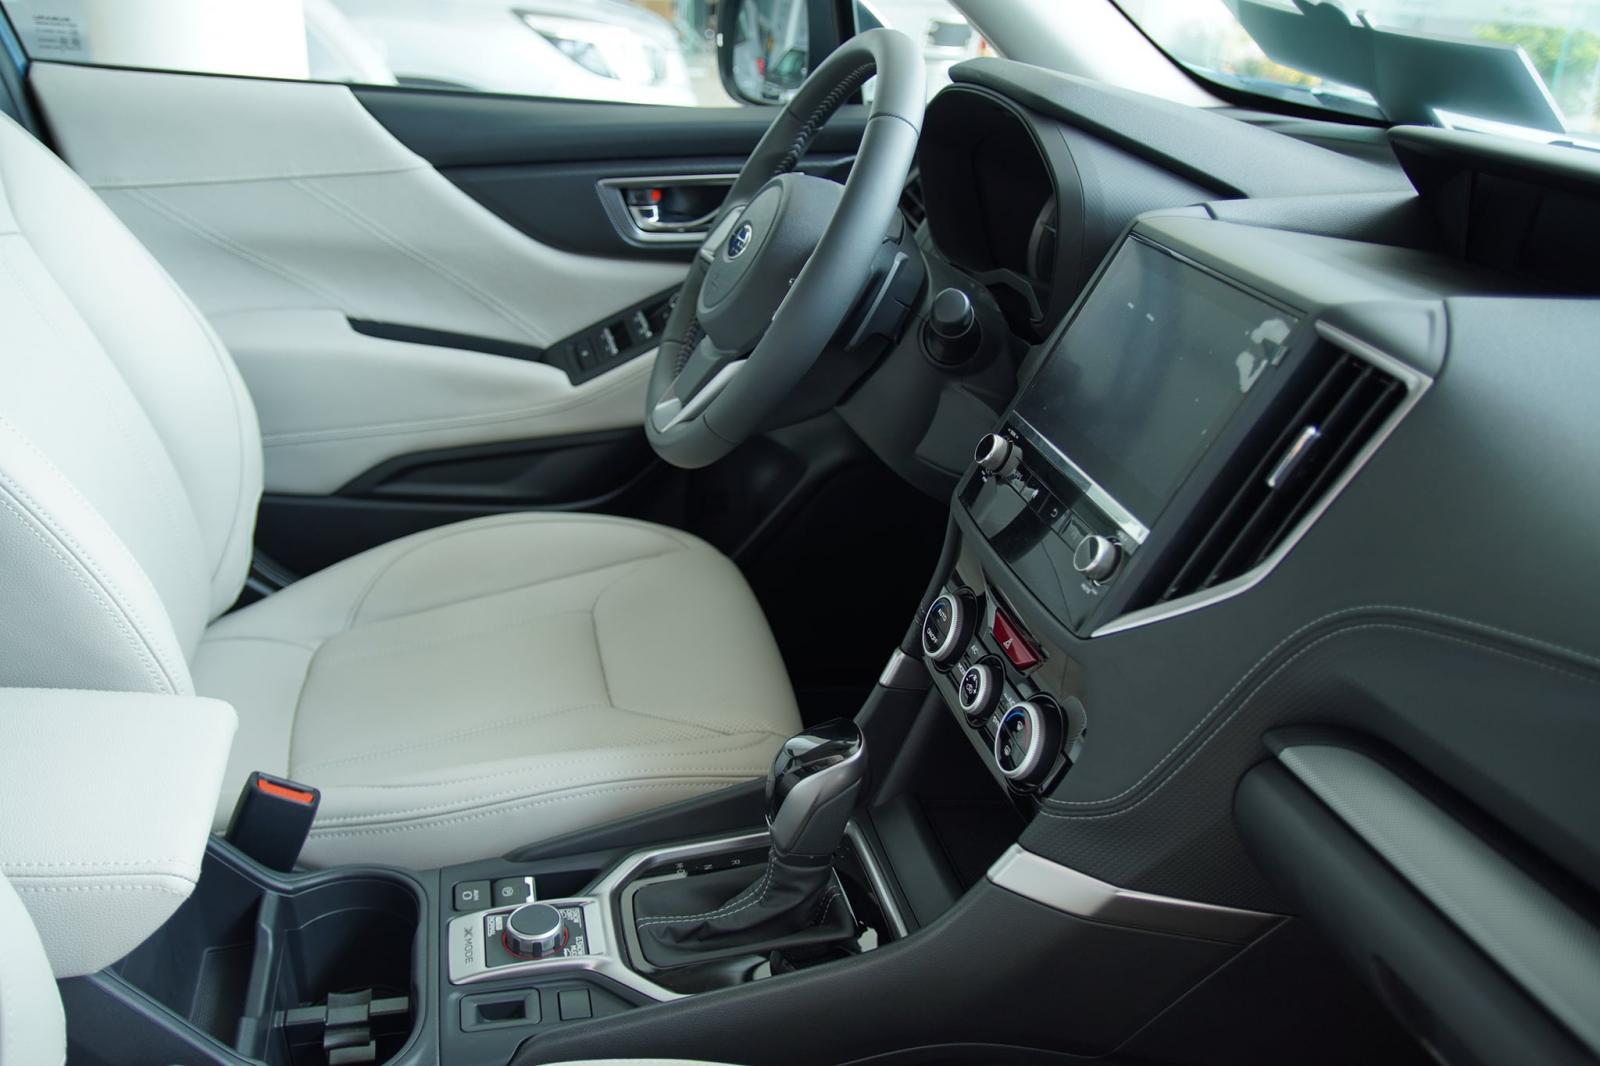 Subaru Forester 2.0 iL - Full màu - Giá tốt